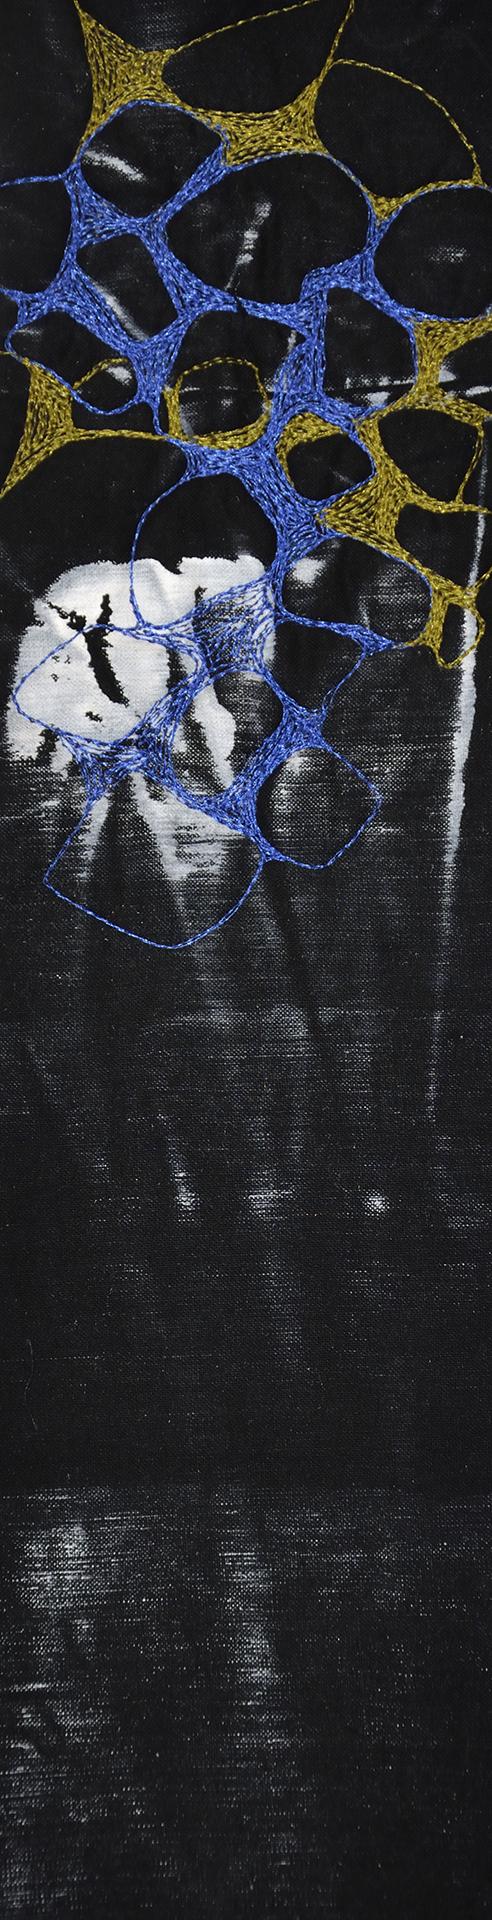 Fragment 12, 2016, 35 x 9 cm